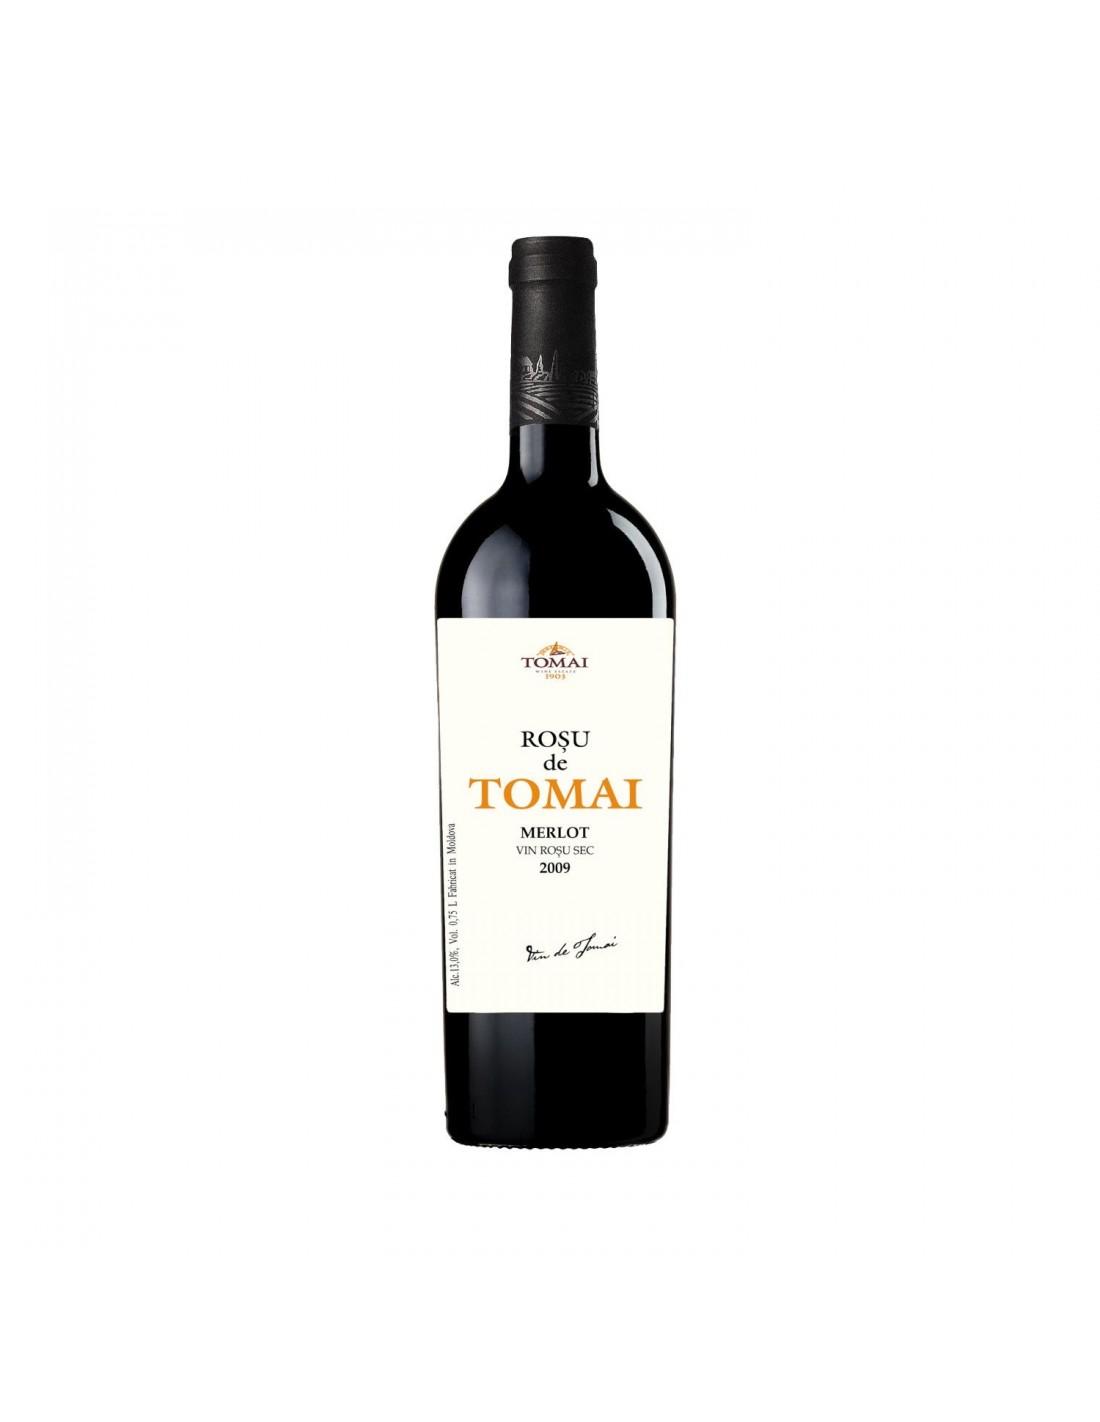 Vin rosu sec, Merlot, Rosu de Tomai, 0.75L, 13% alc., Republica Moldova